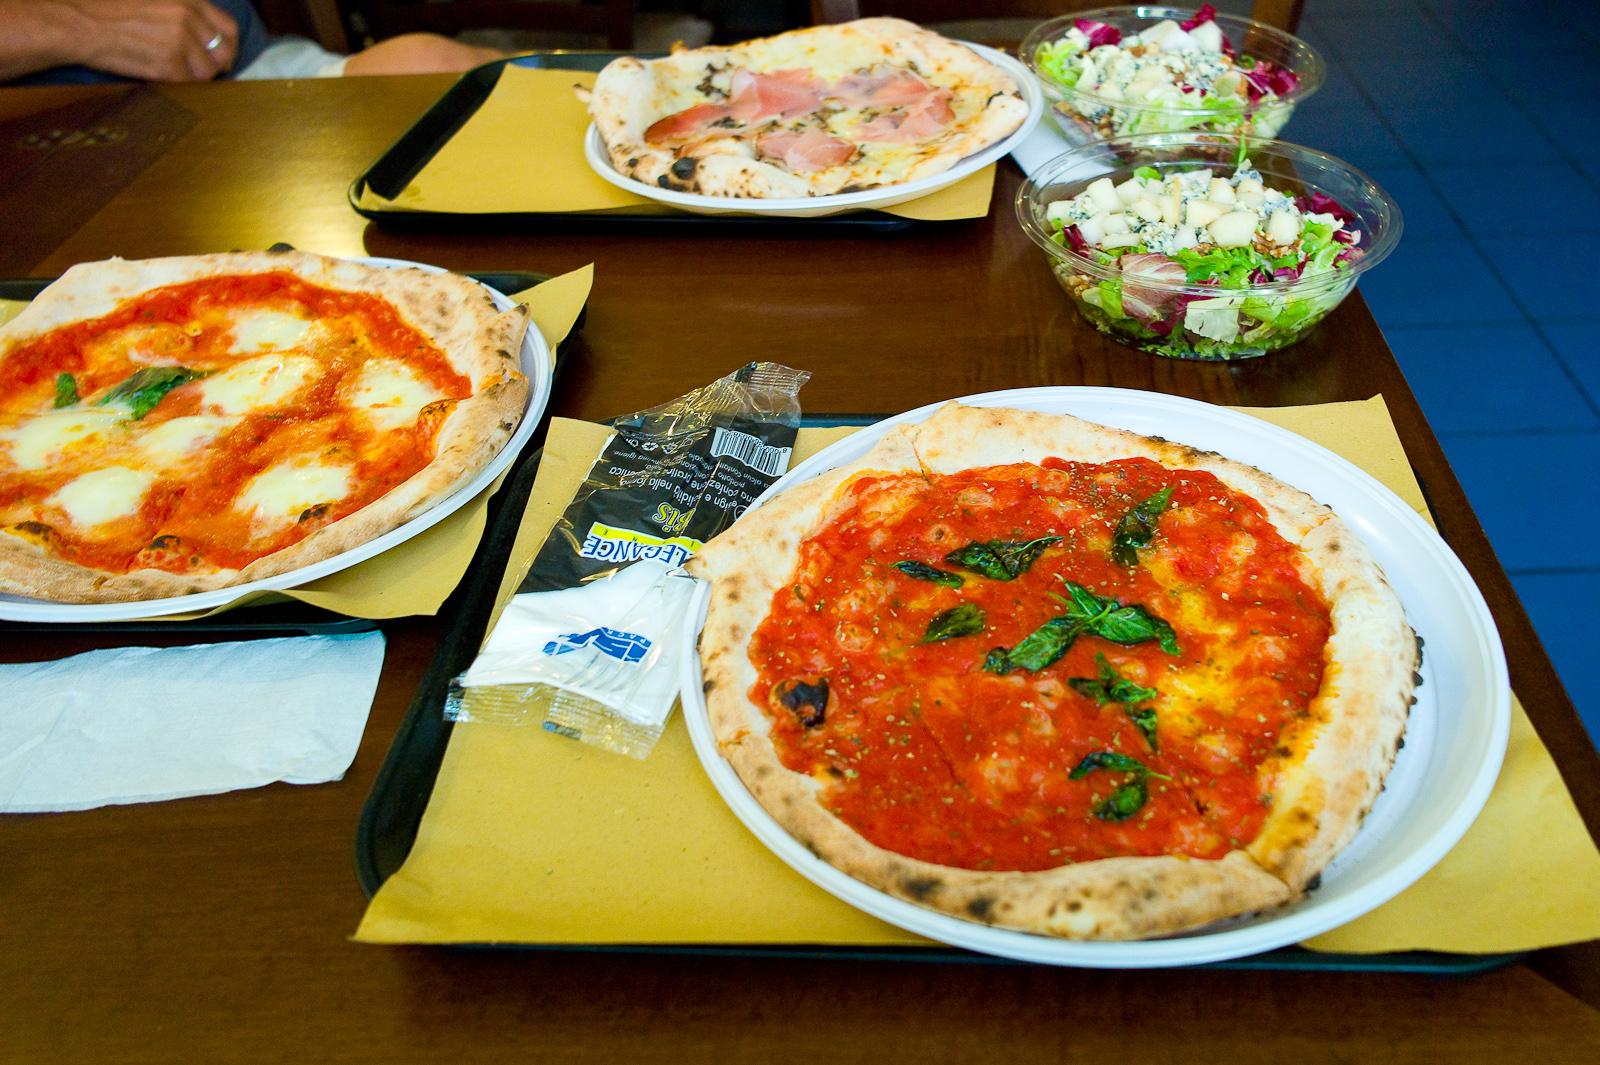 Pizza margherita, pizza marinara, pizza with speck and tomato, walnut salad